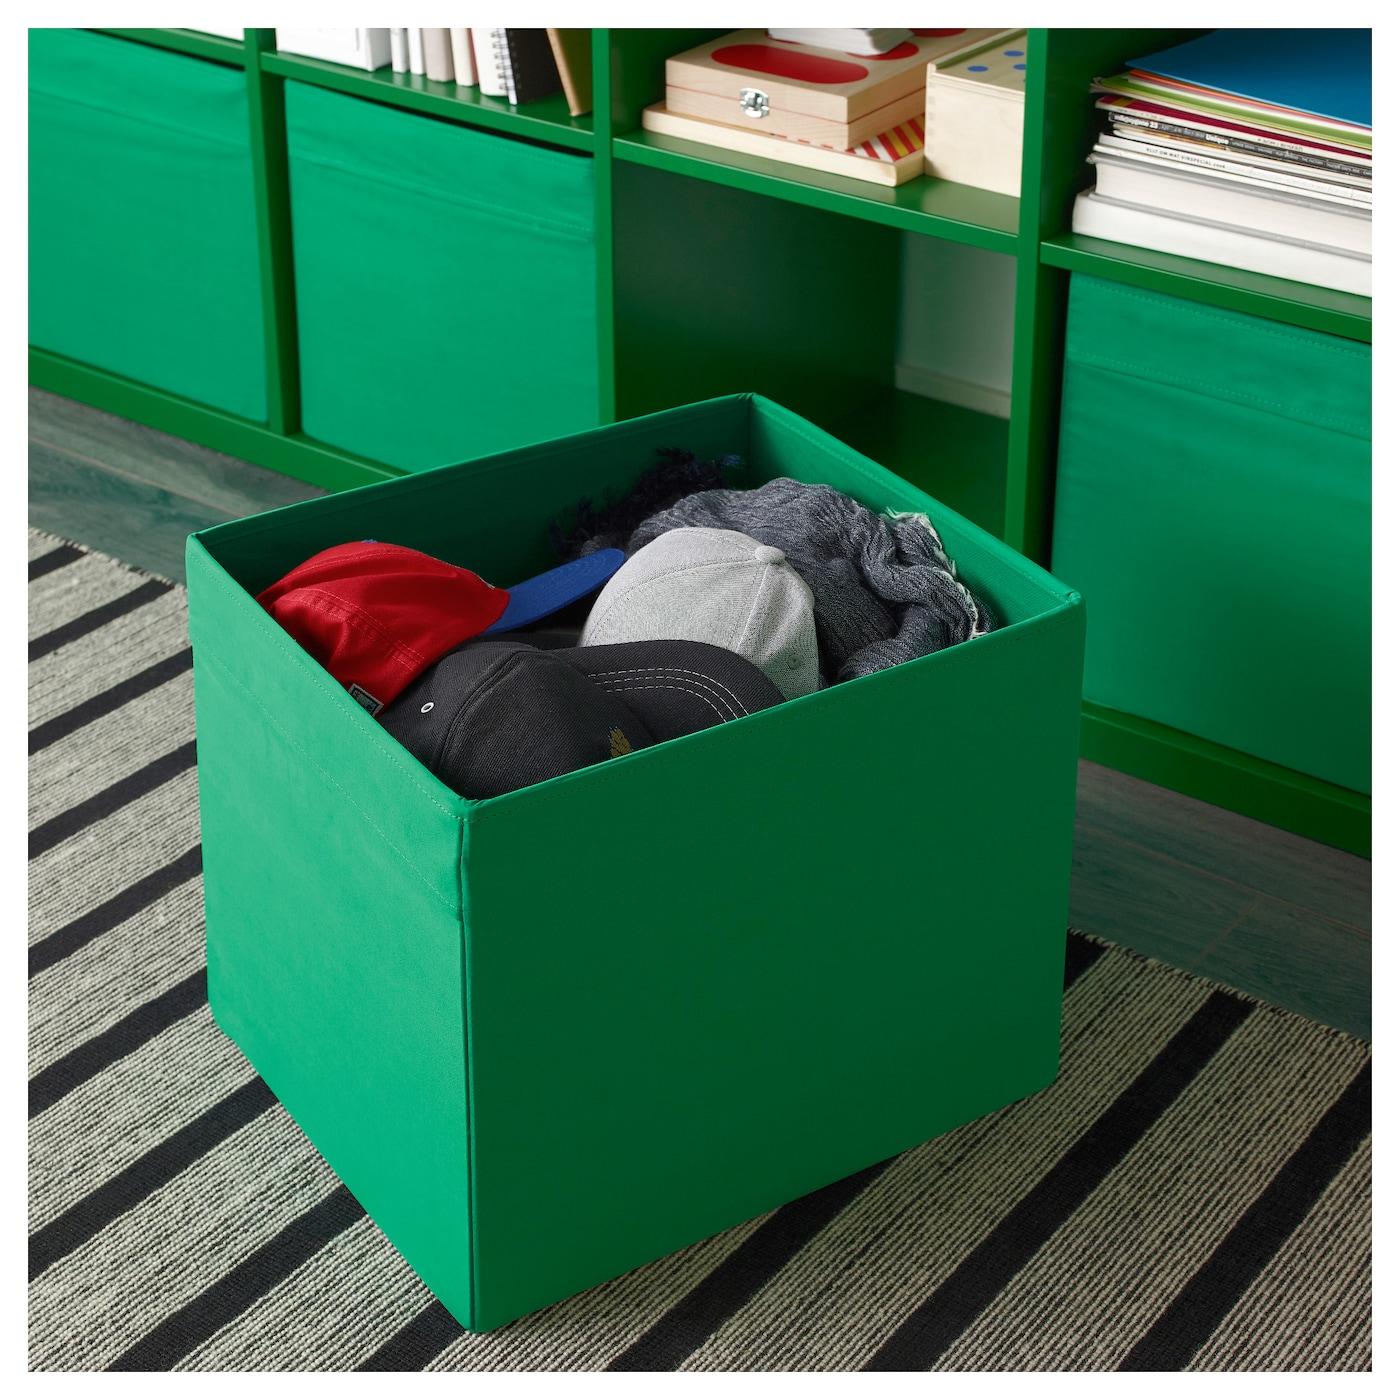 dr na rangement tissu vert 33x38x33 cm ikea. Black Bedroom Furniture Sets. Home Design Ideas